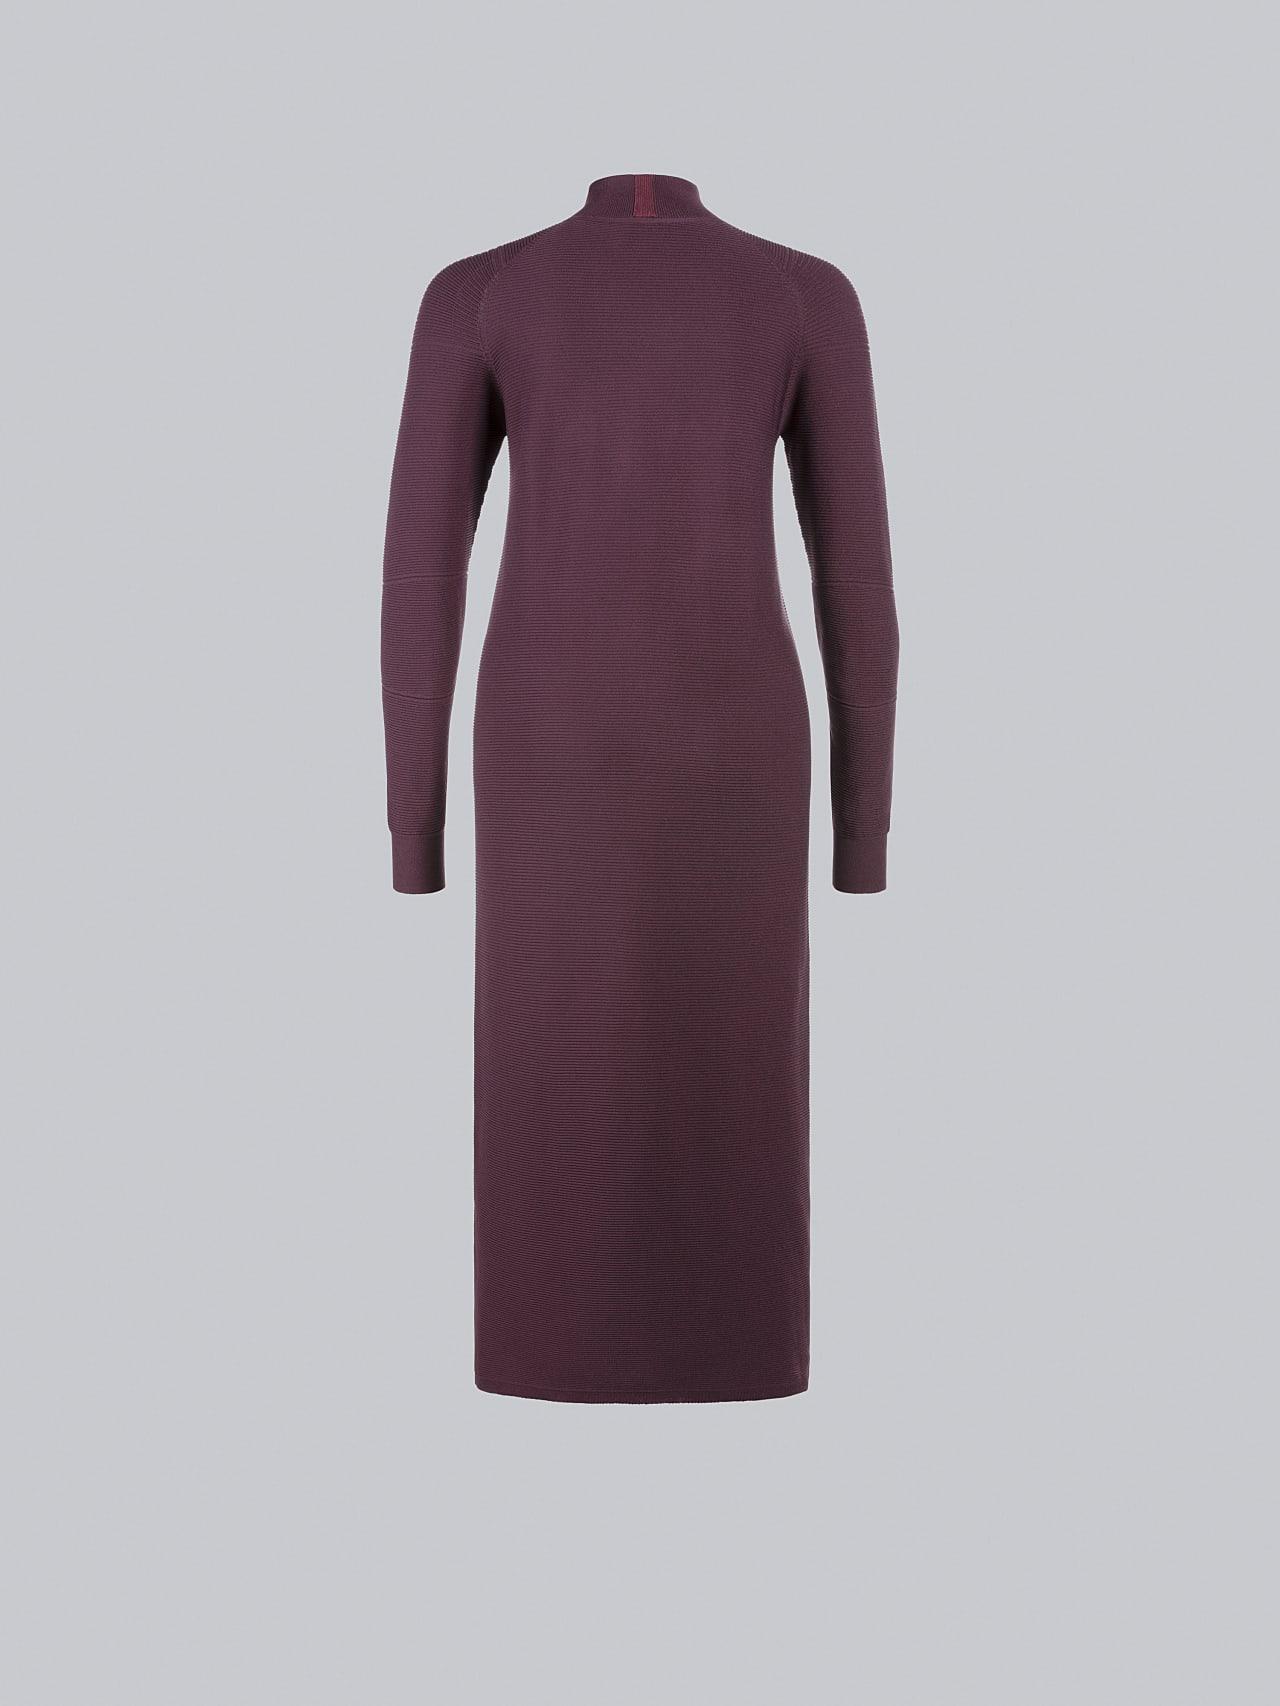 FOXEE V1.Y5.02 Seamless 3D Knit Mock-Neck Dress Burgundy Left Alpha Tauri